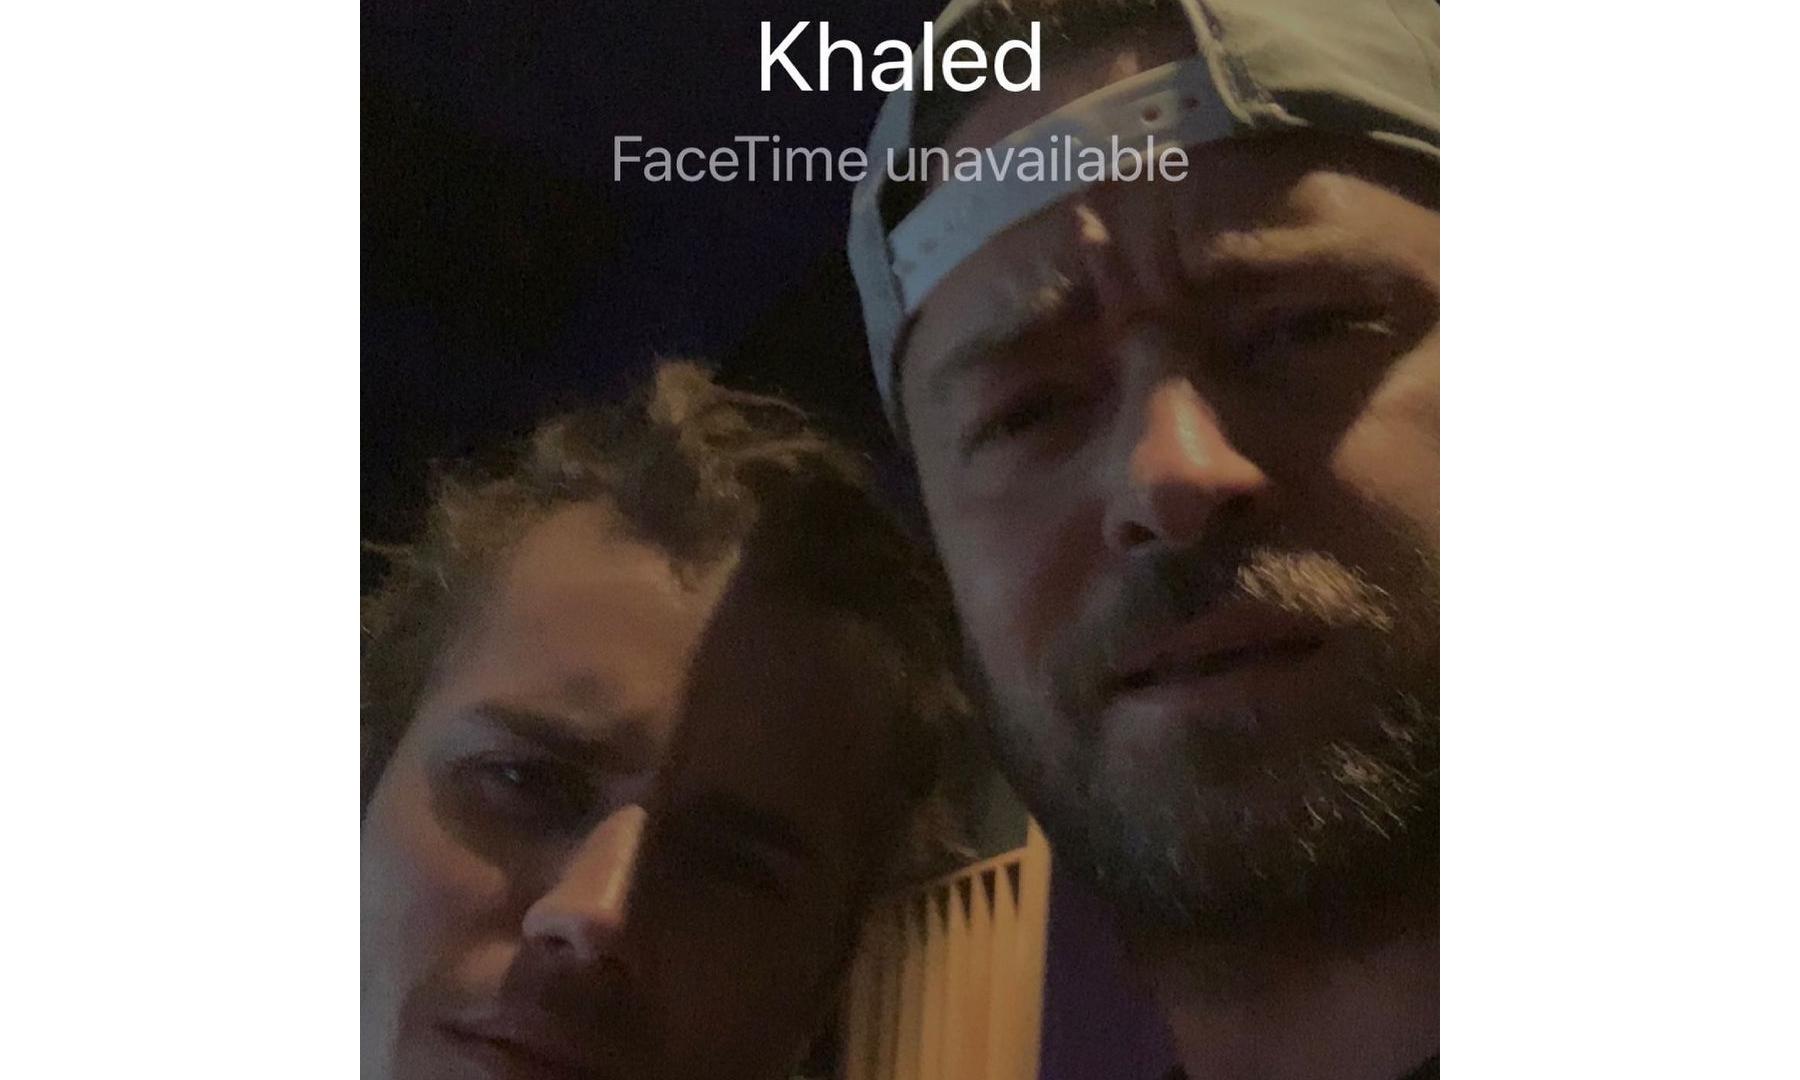 Justin Bieber 与 Justin Timberlake 将在 DJ Khaled 的新专辑中进行合作